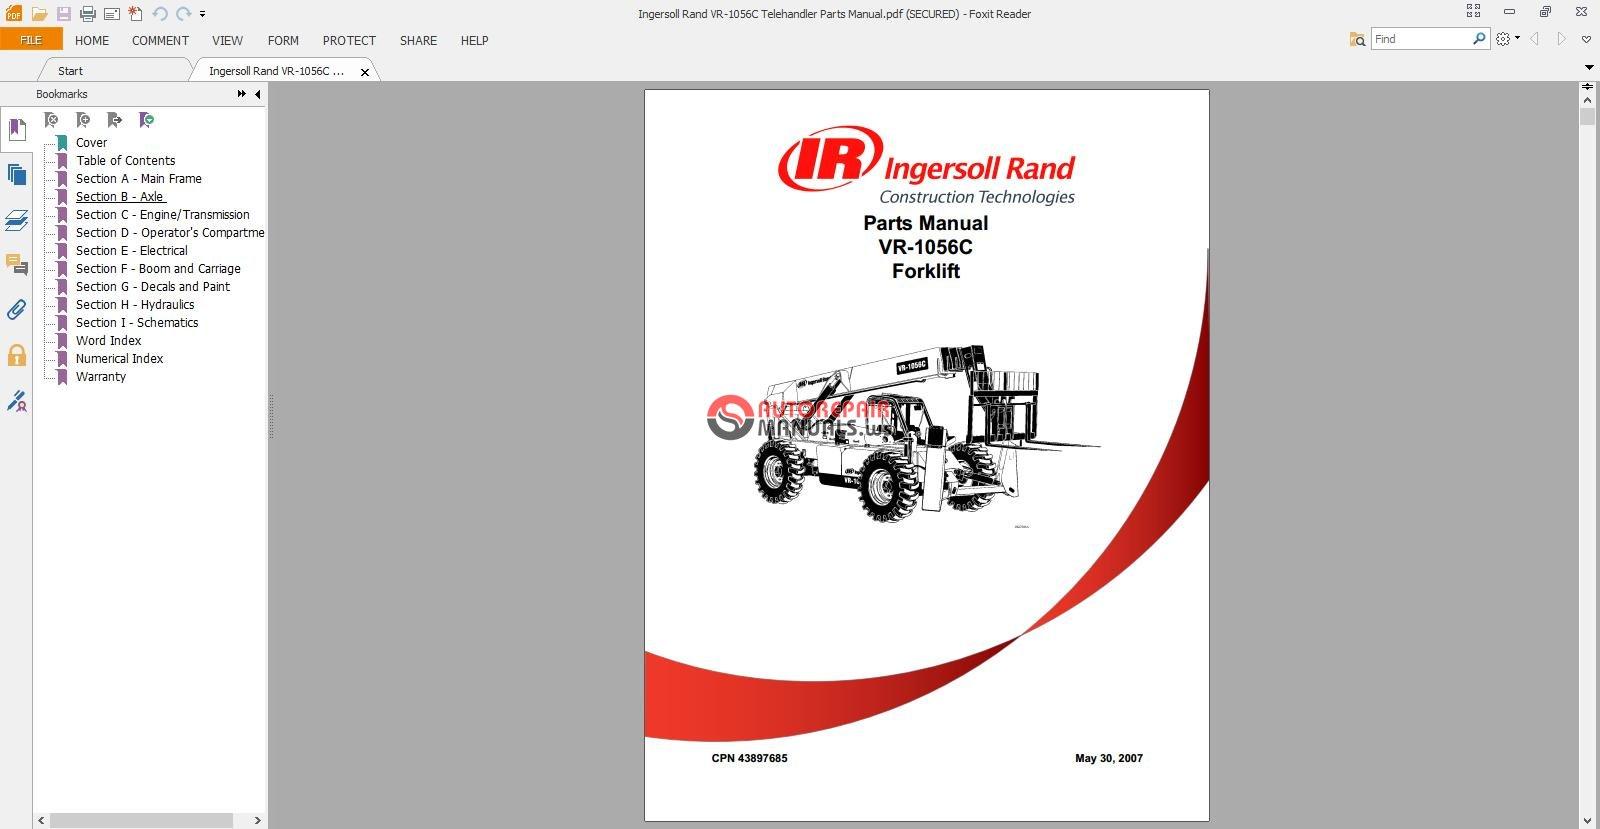 Ingersoll Rand VR-1056C Telehandler Parts Manual.jpg